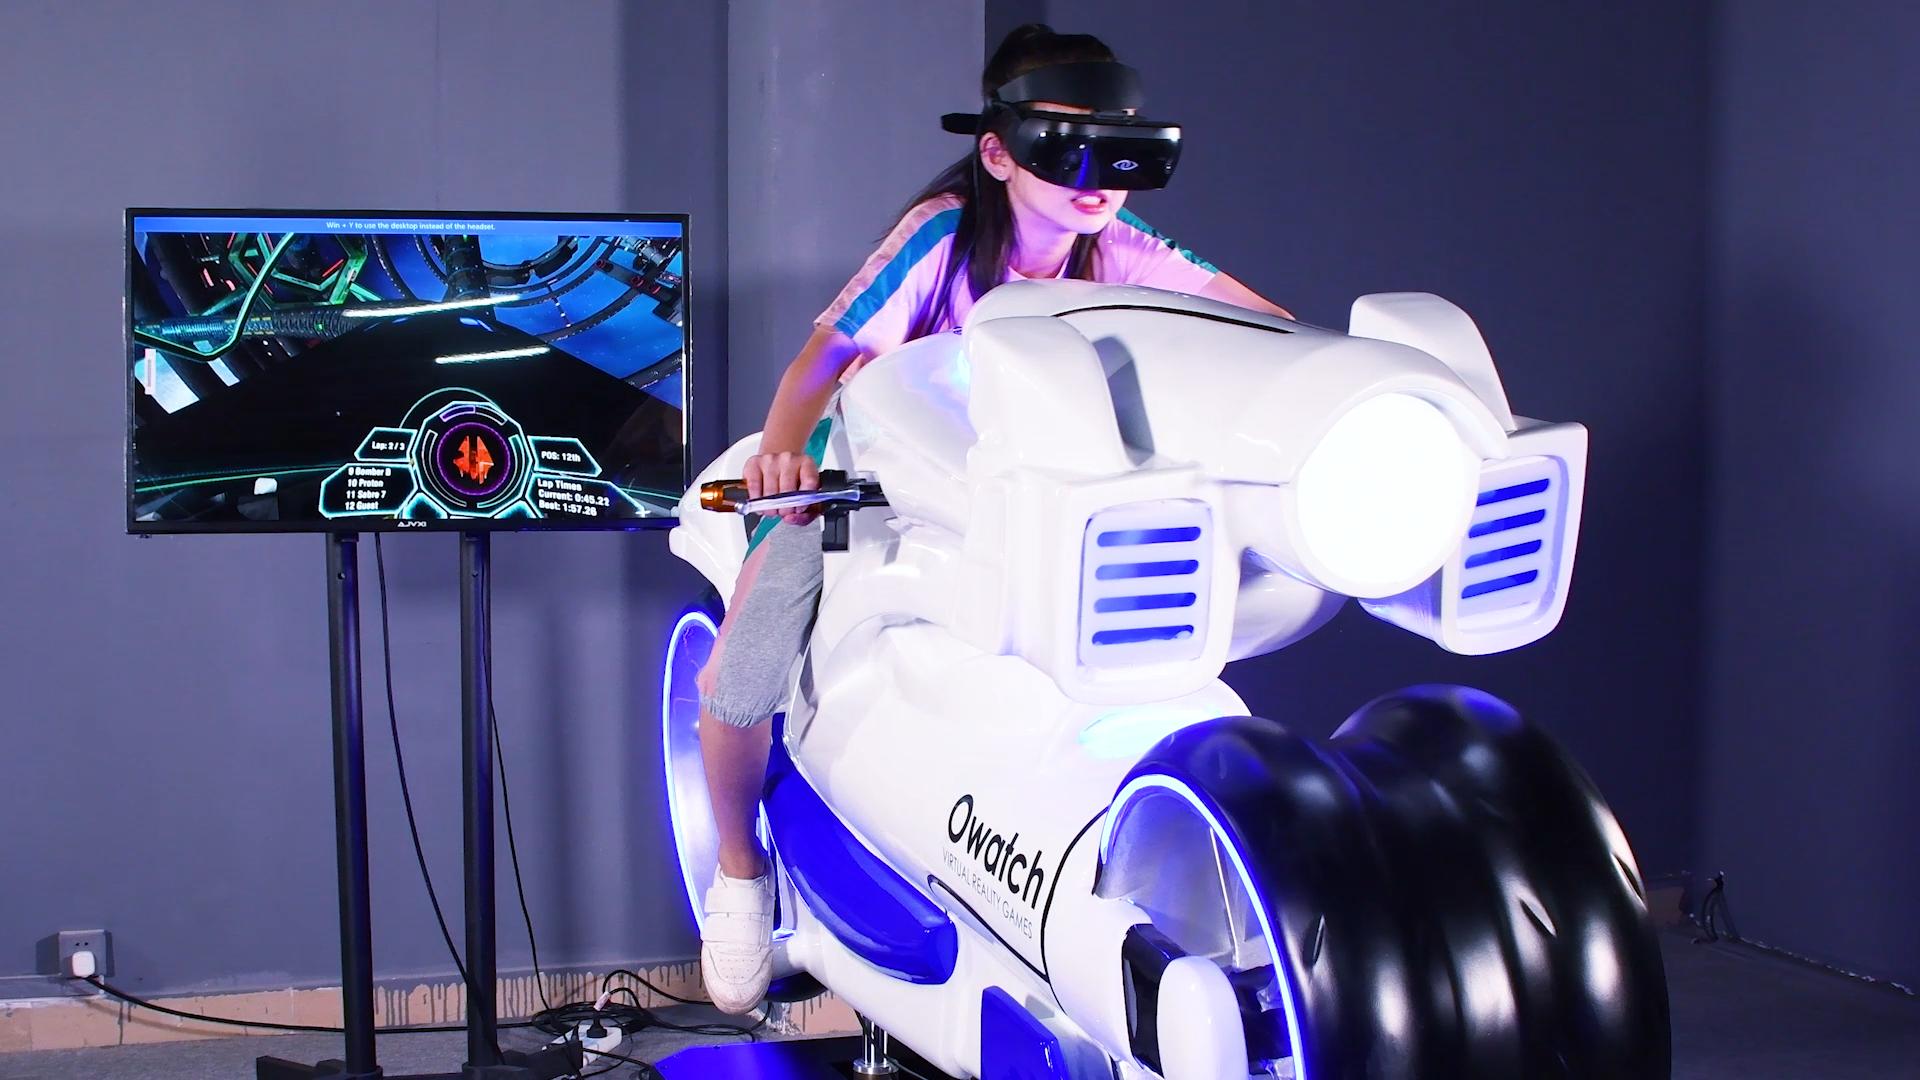 VR Kedatangan Baru Sepeda Motor Tinggi Perasaan Nyata Kecepatan Balap Fashion VR Permainan Simulator untuk VR Theme Park